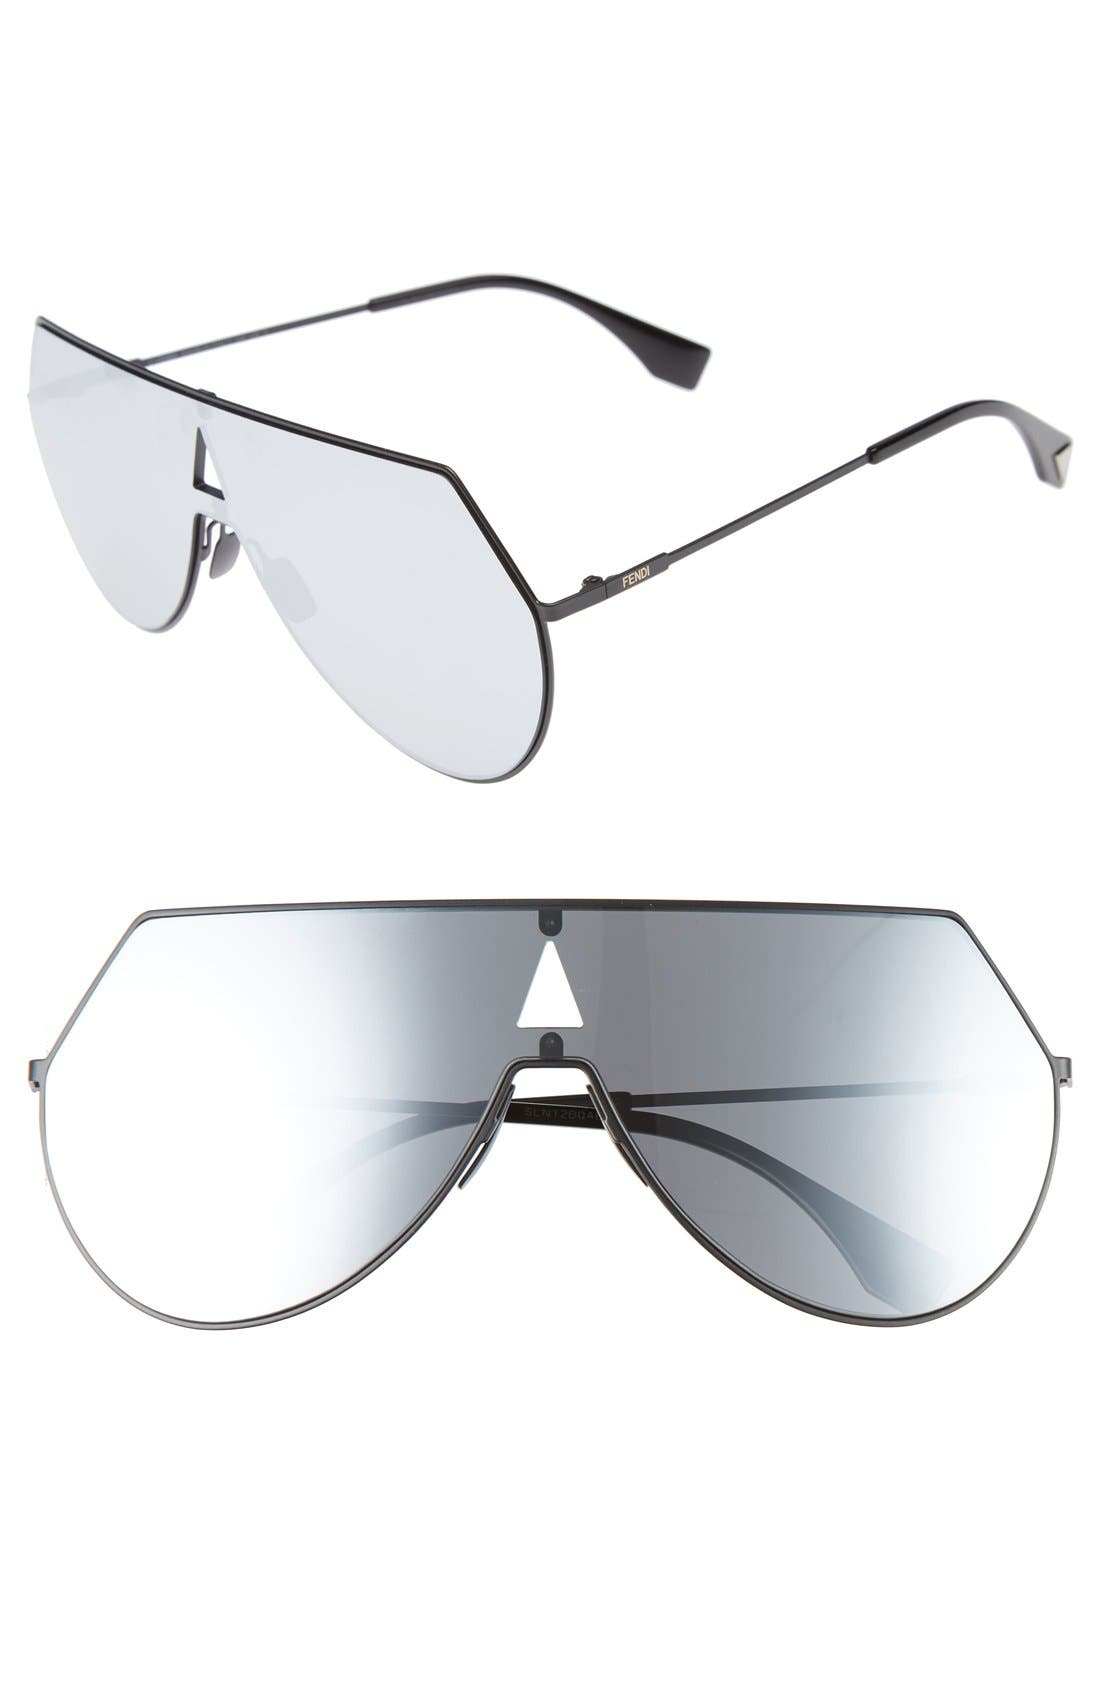 99mm Eyeline Aviator Sunglasses,                             Main thumbnail 1, color,                             MATTE BLACK